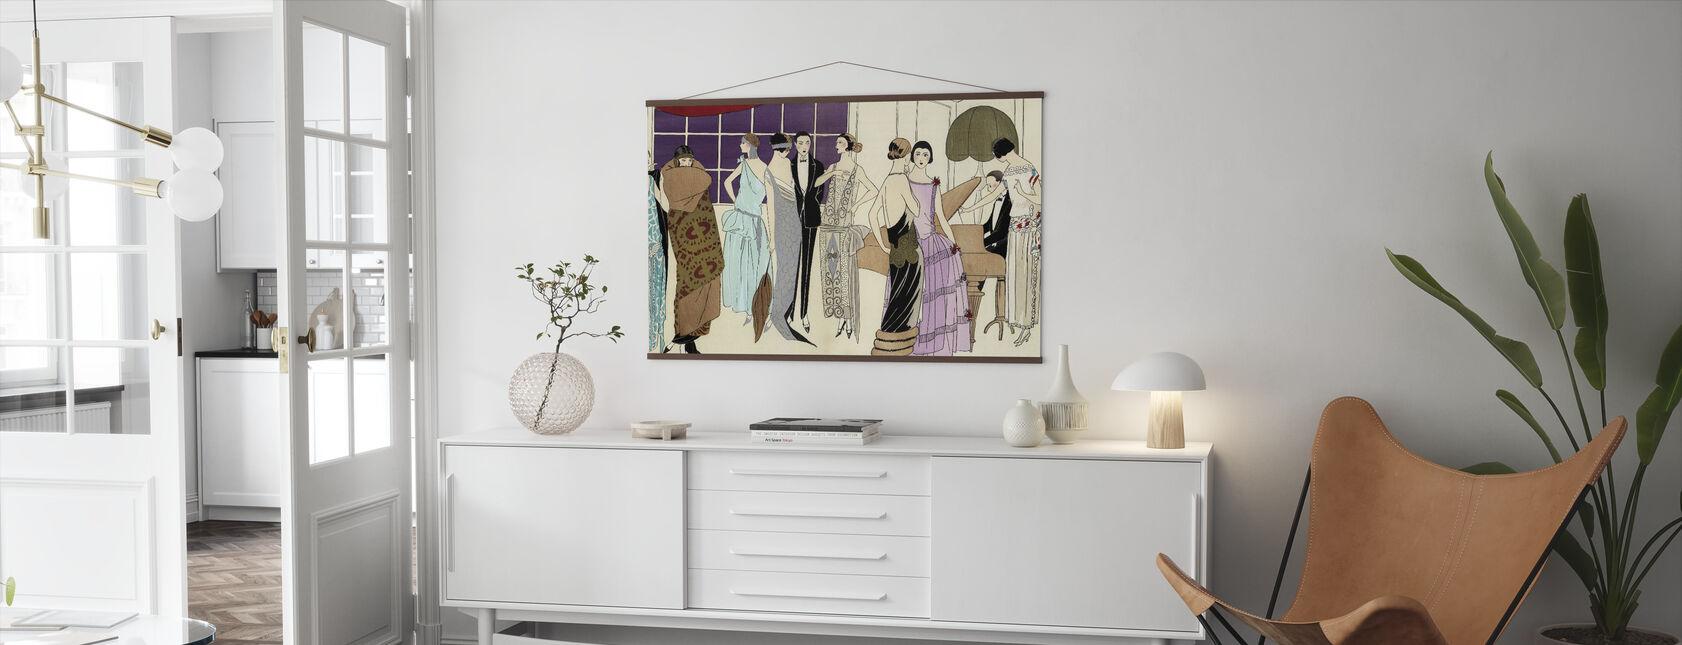 Avondfeest - Poster - Woonkamer